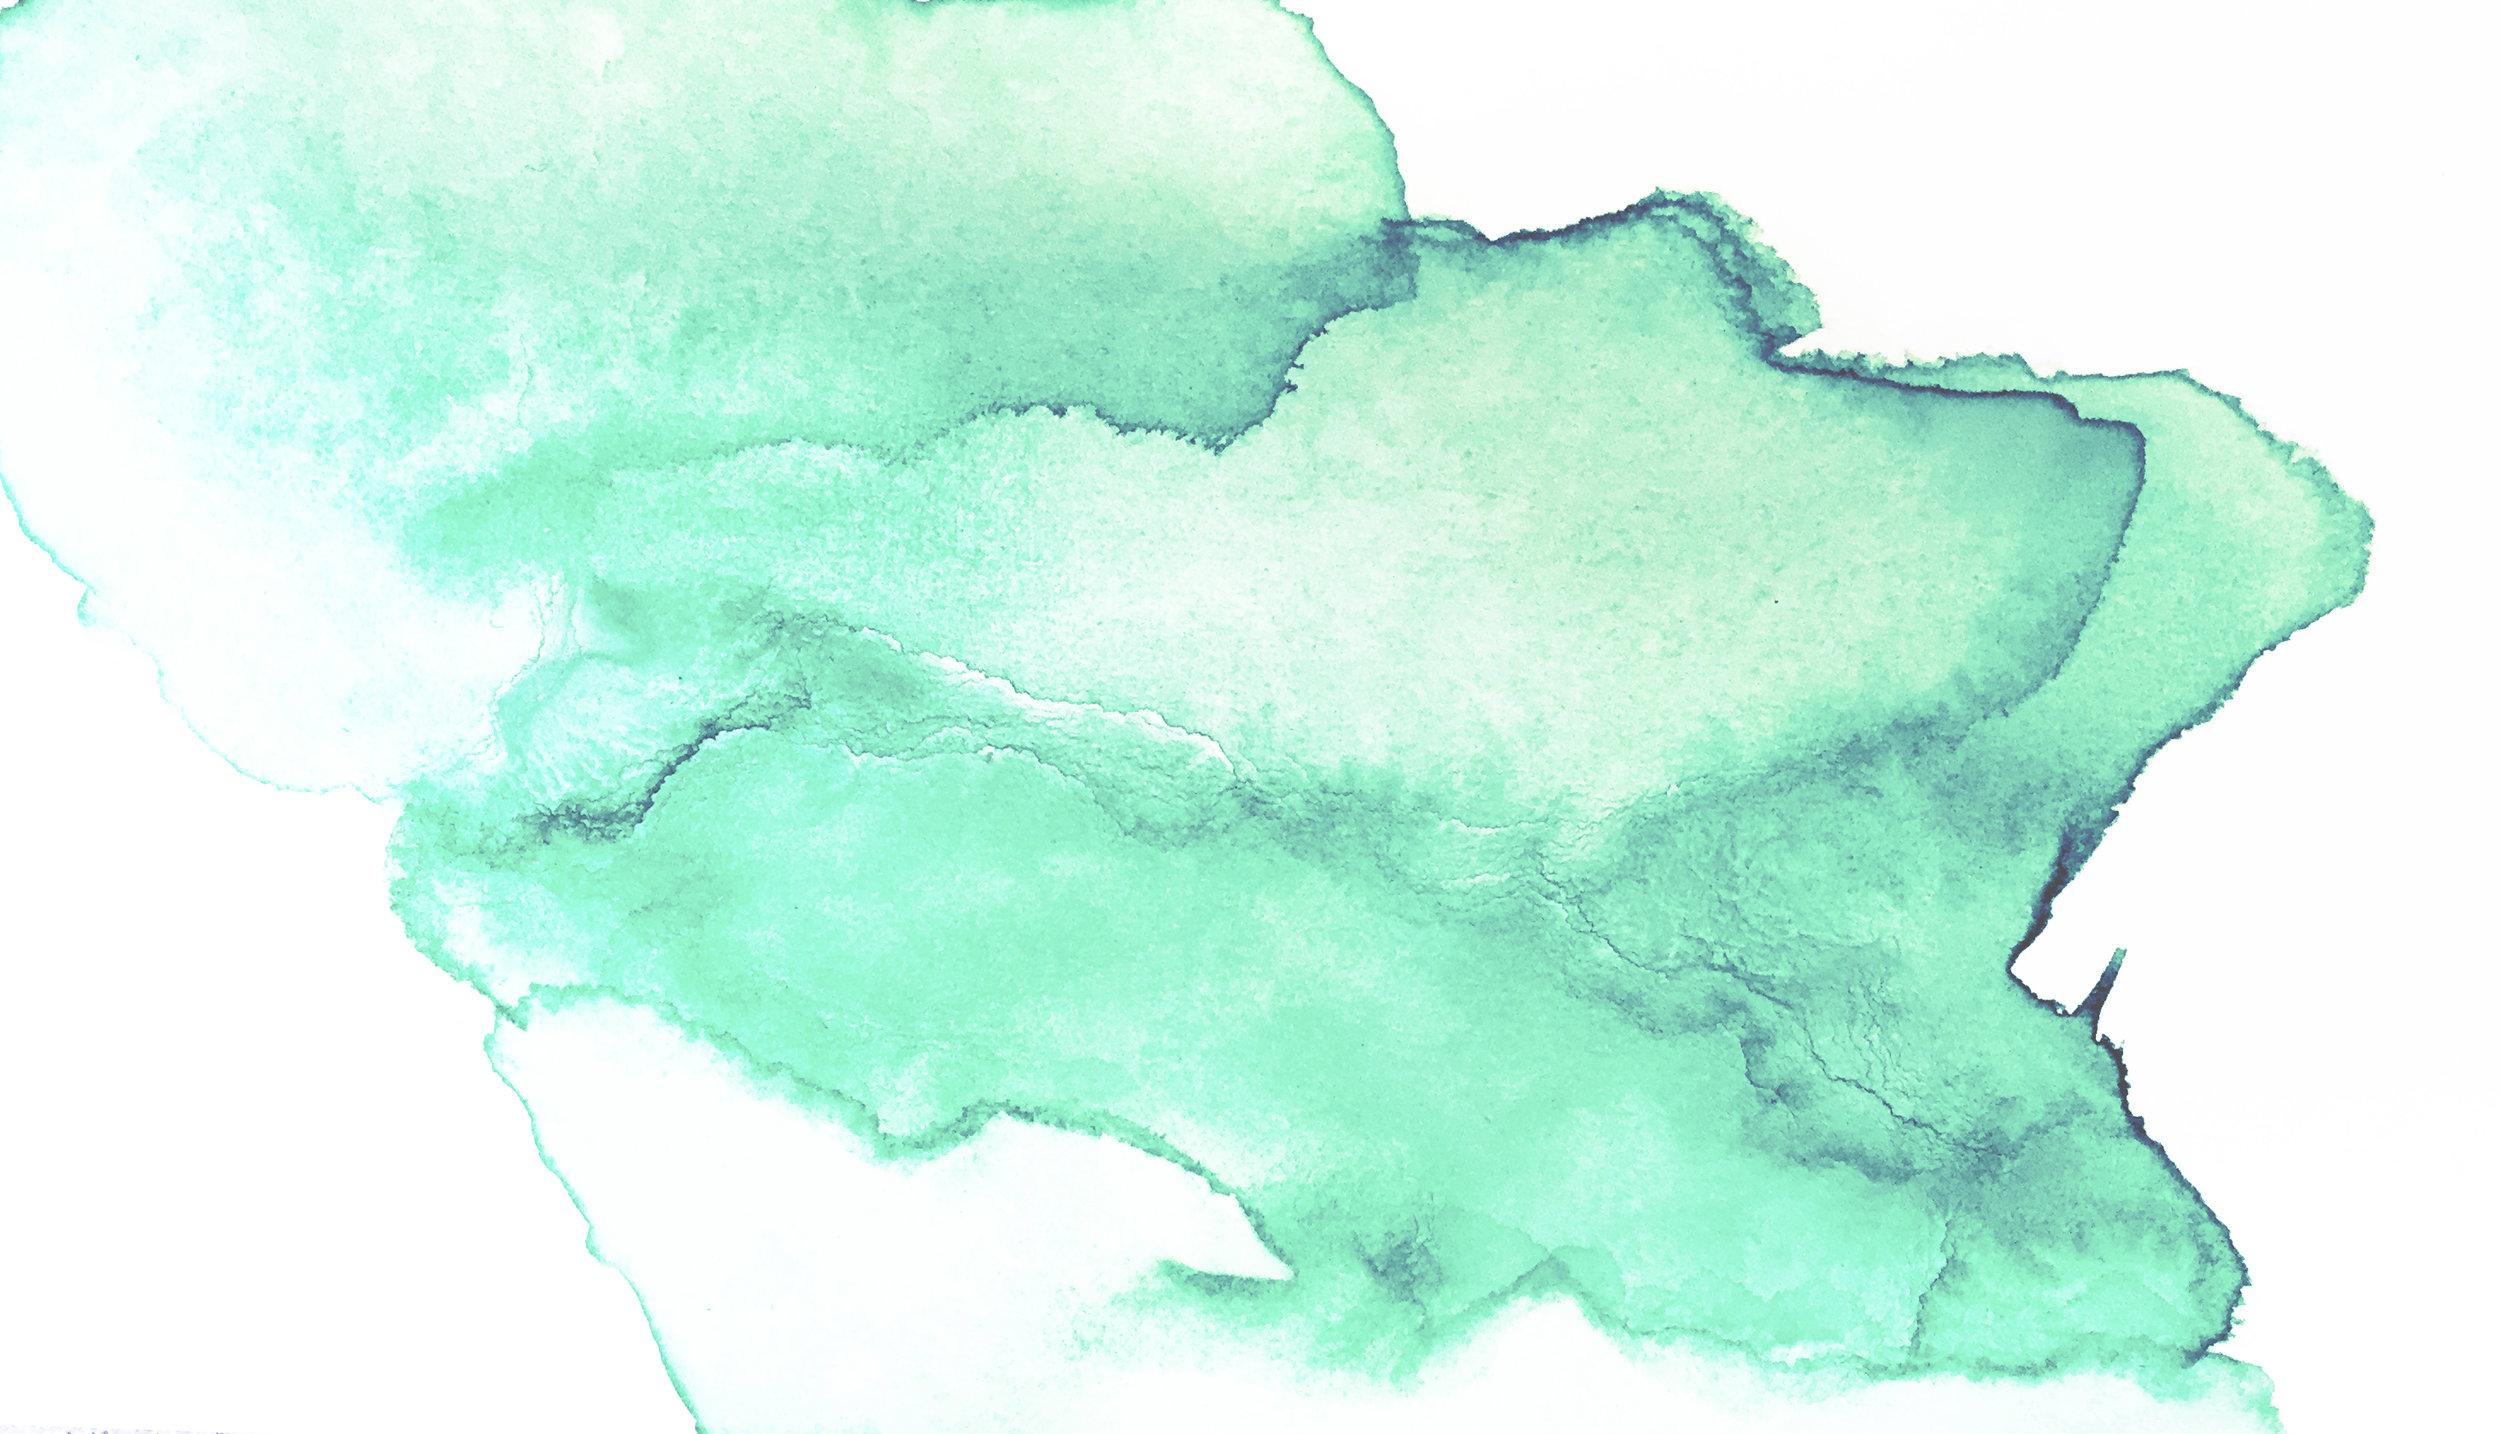 Watercolor_Green1.jpg